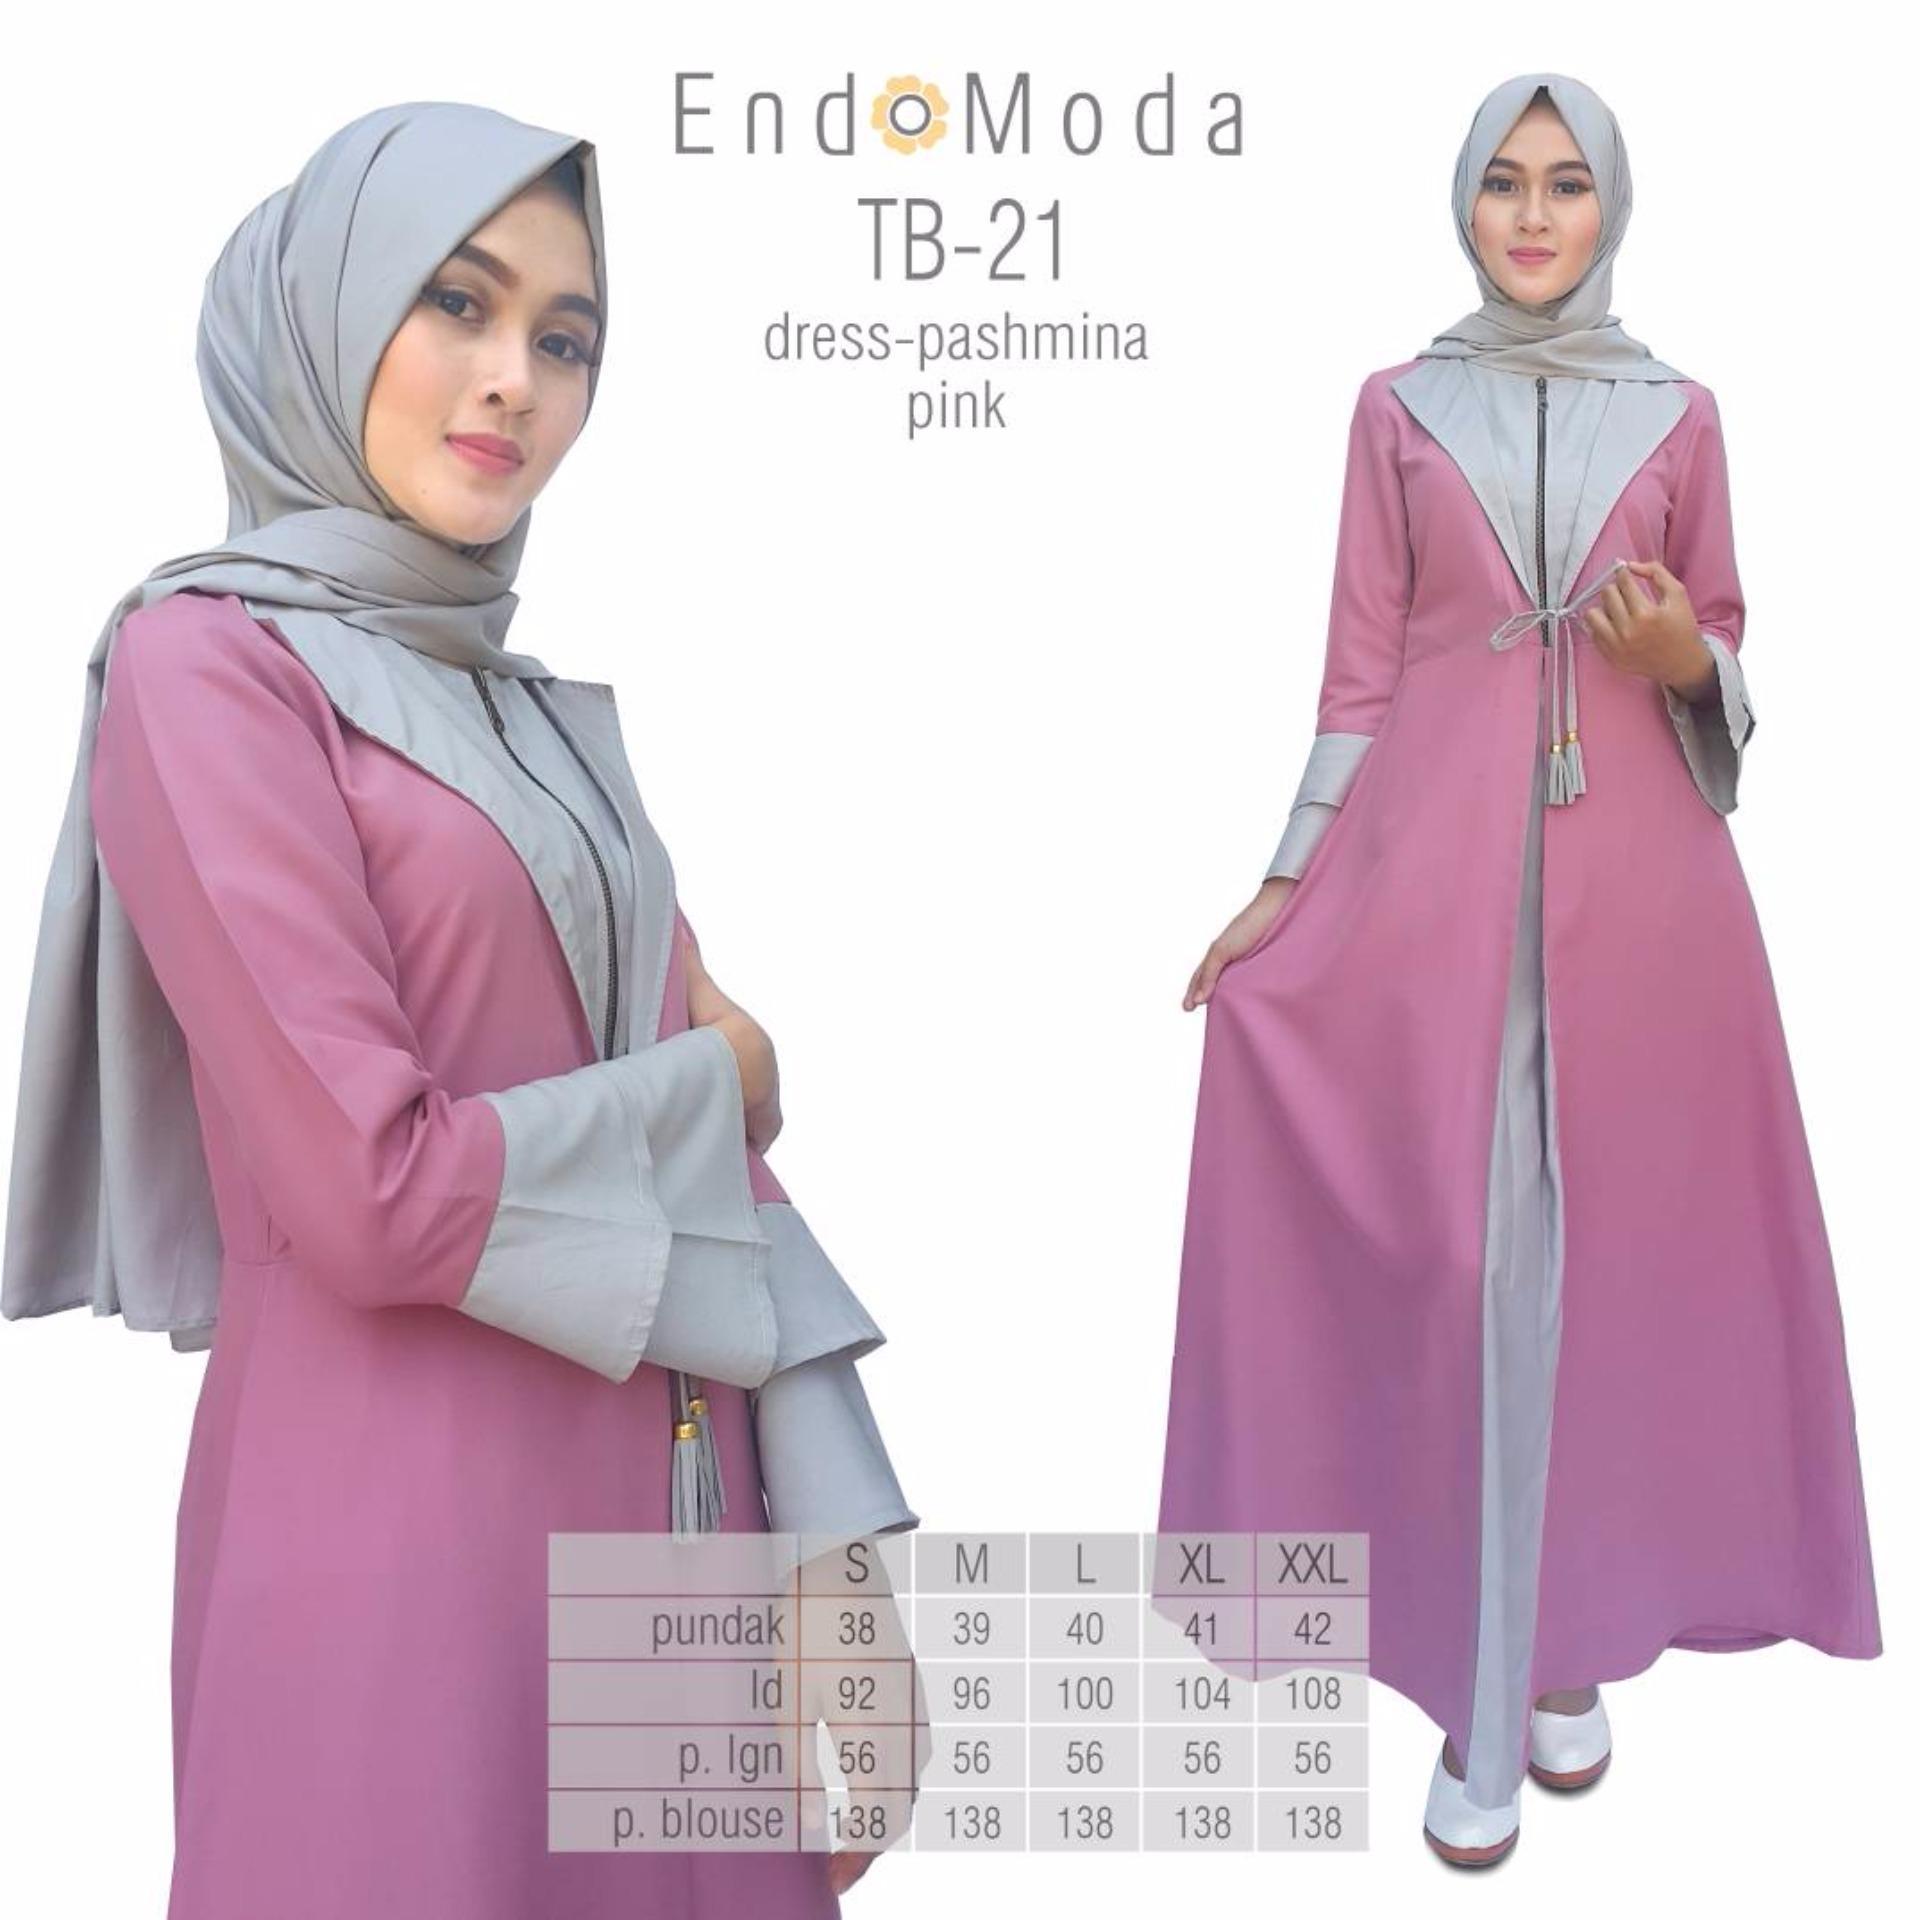 ... Baju Original Endo Moda TB-21 Dress Wanita Baju Muslim Modern Gamis  Katun Supernova Premium dd557ec747